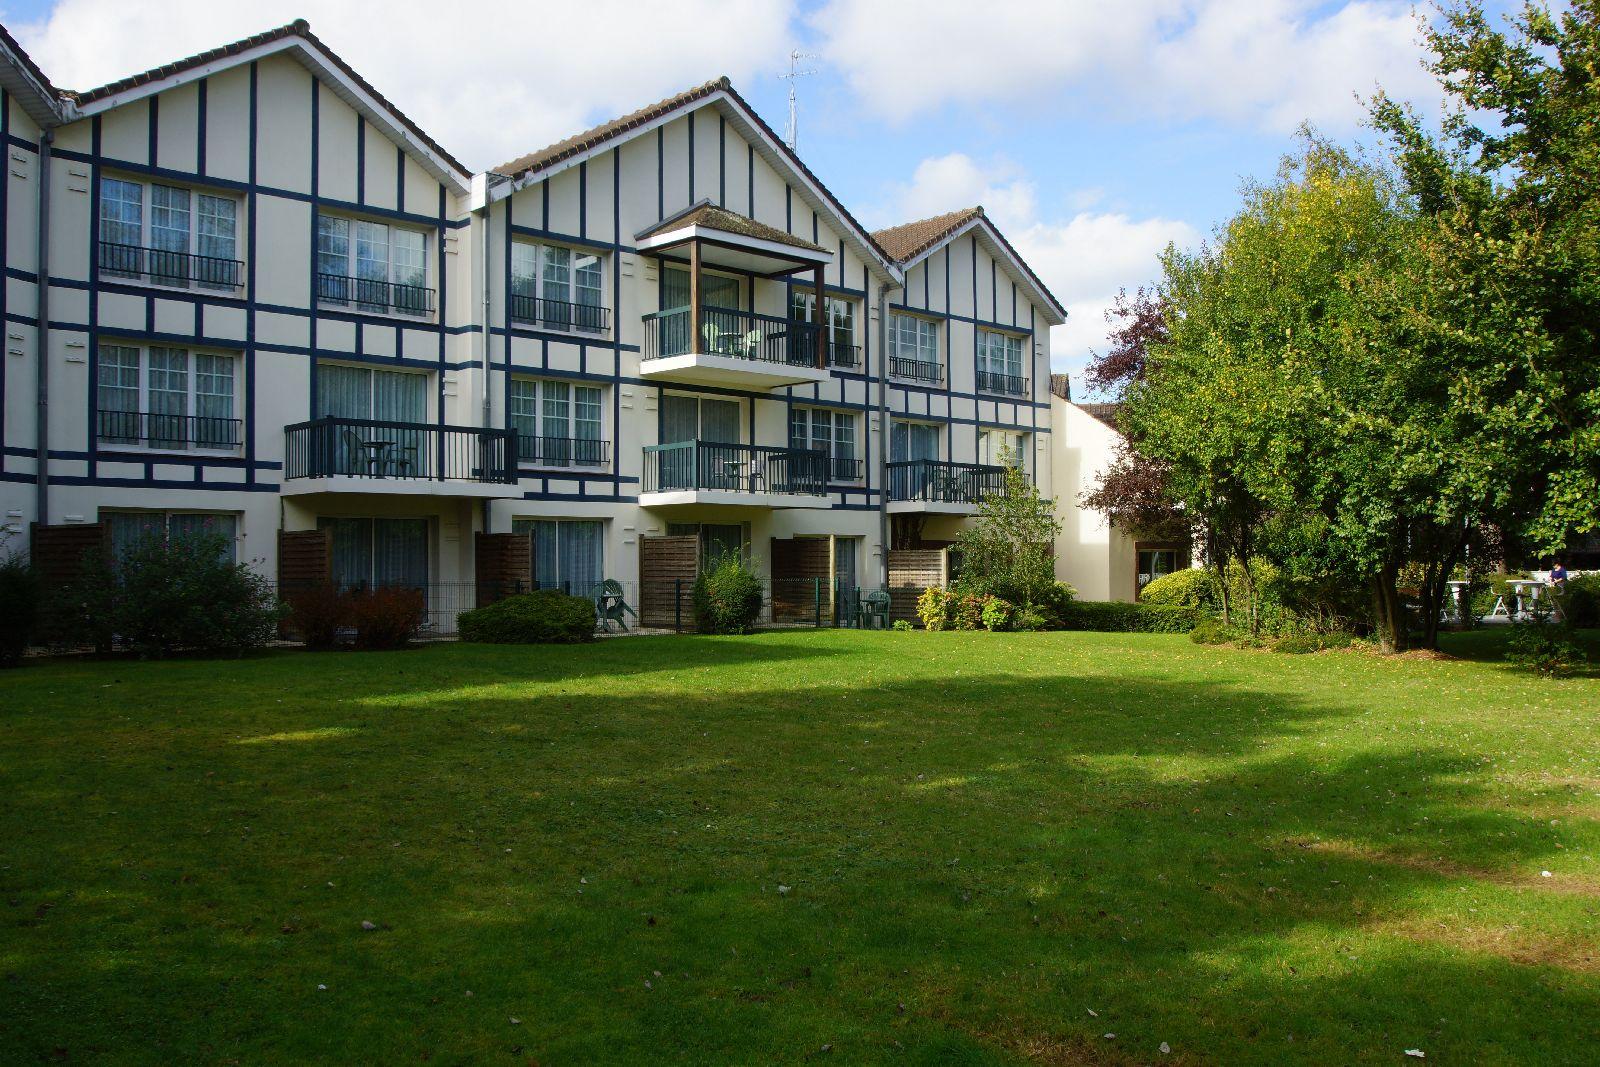 golf-expedition-golf-reizen-frankrijk-regio-pas-de-calais-hotel-du-parc-vooraanzicht-hotel-grasveld.jpg